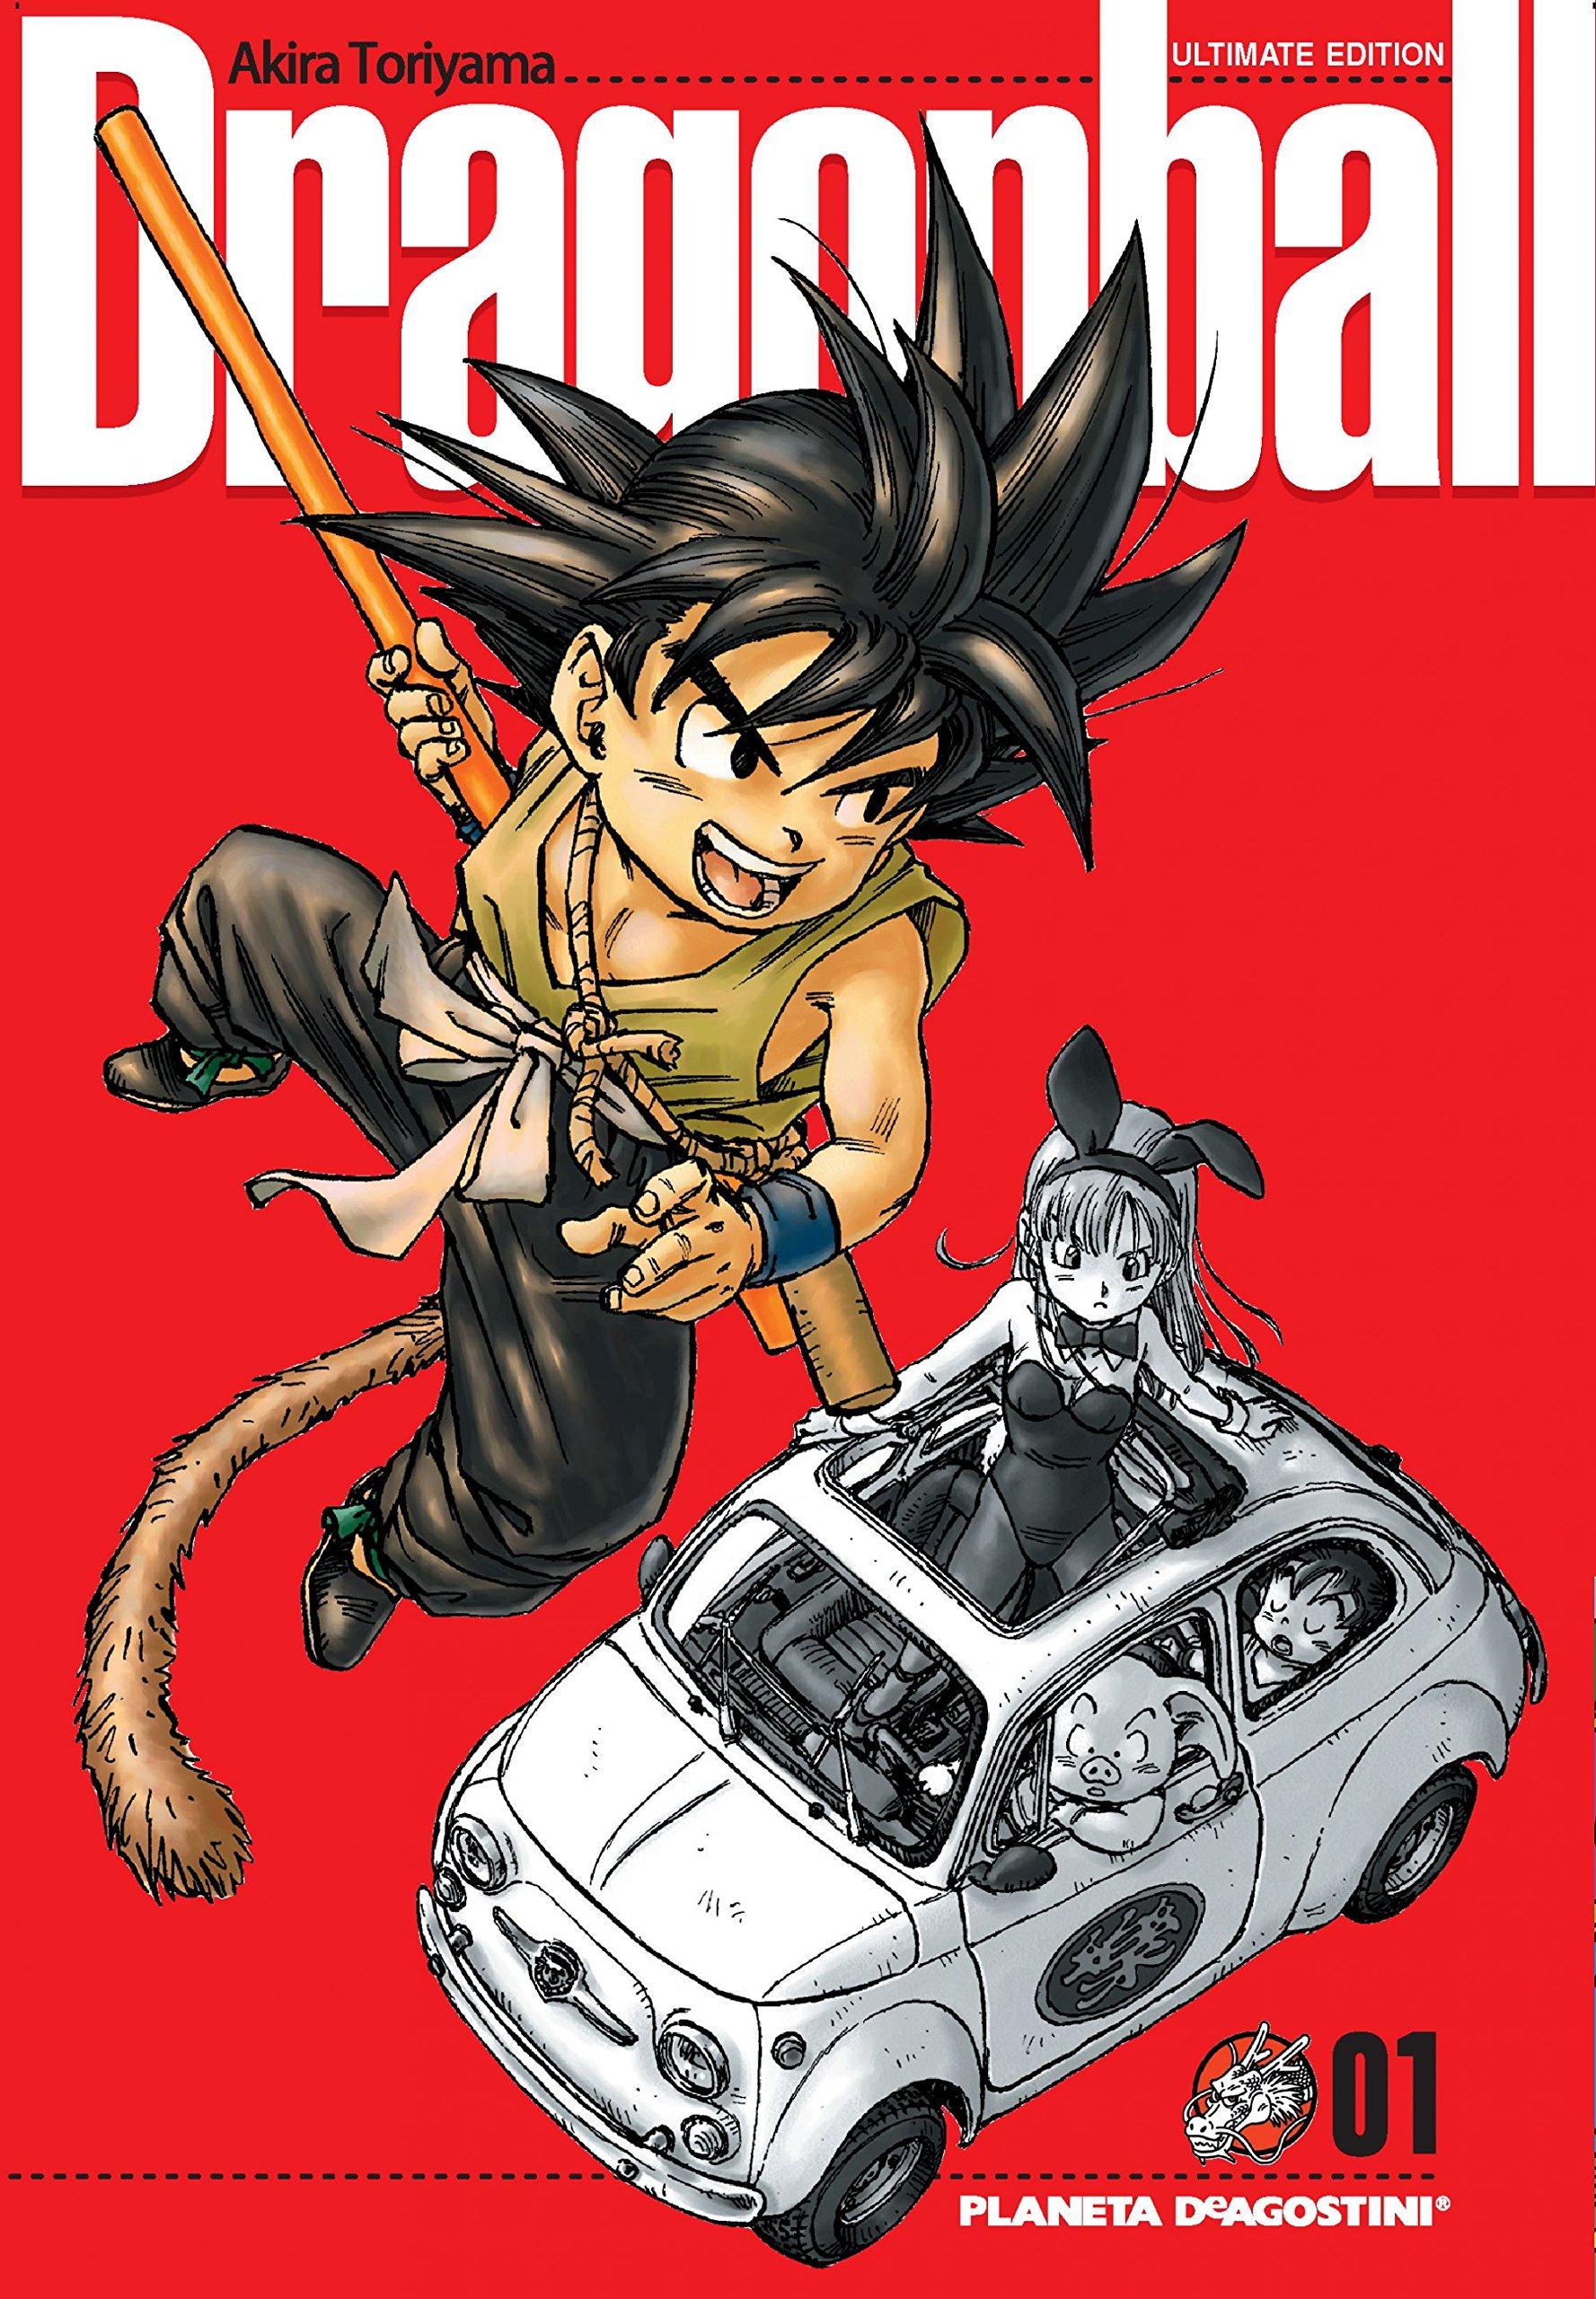 Dragon Ball nº 01/34 (Manga Shonen) Tapa blanda – 18 sep 2007 Akira Toriyama Planeta DeAgostini Cómics 8468470341 1876359